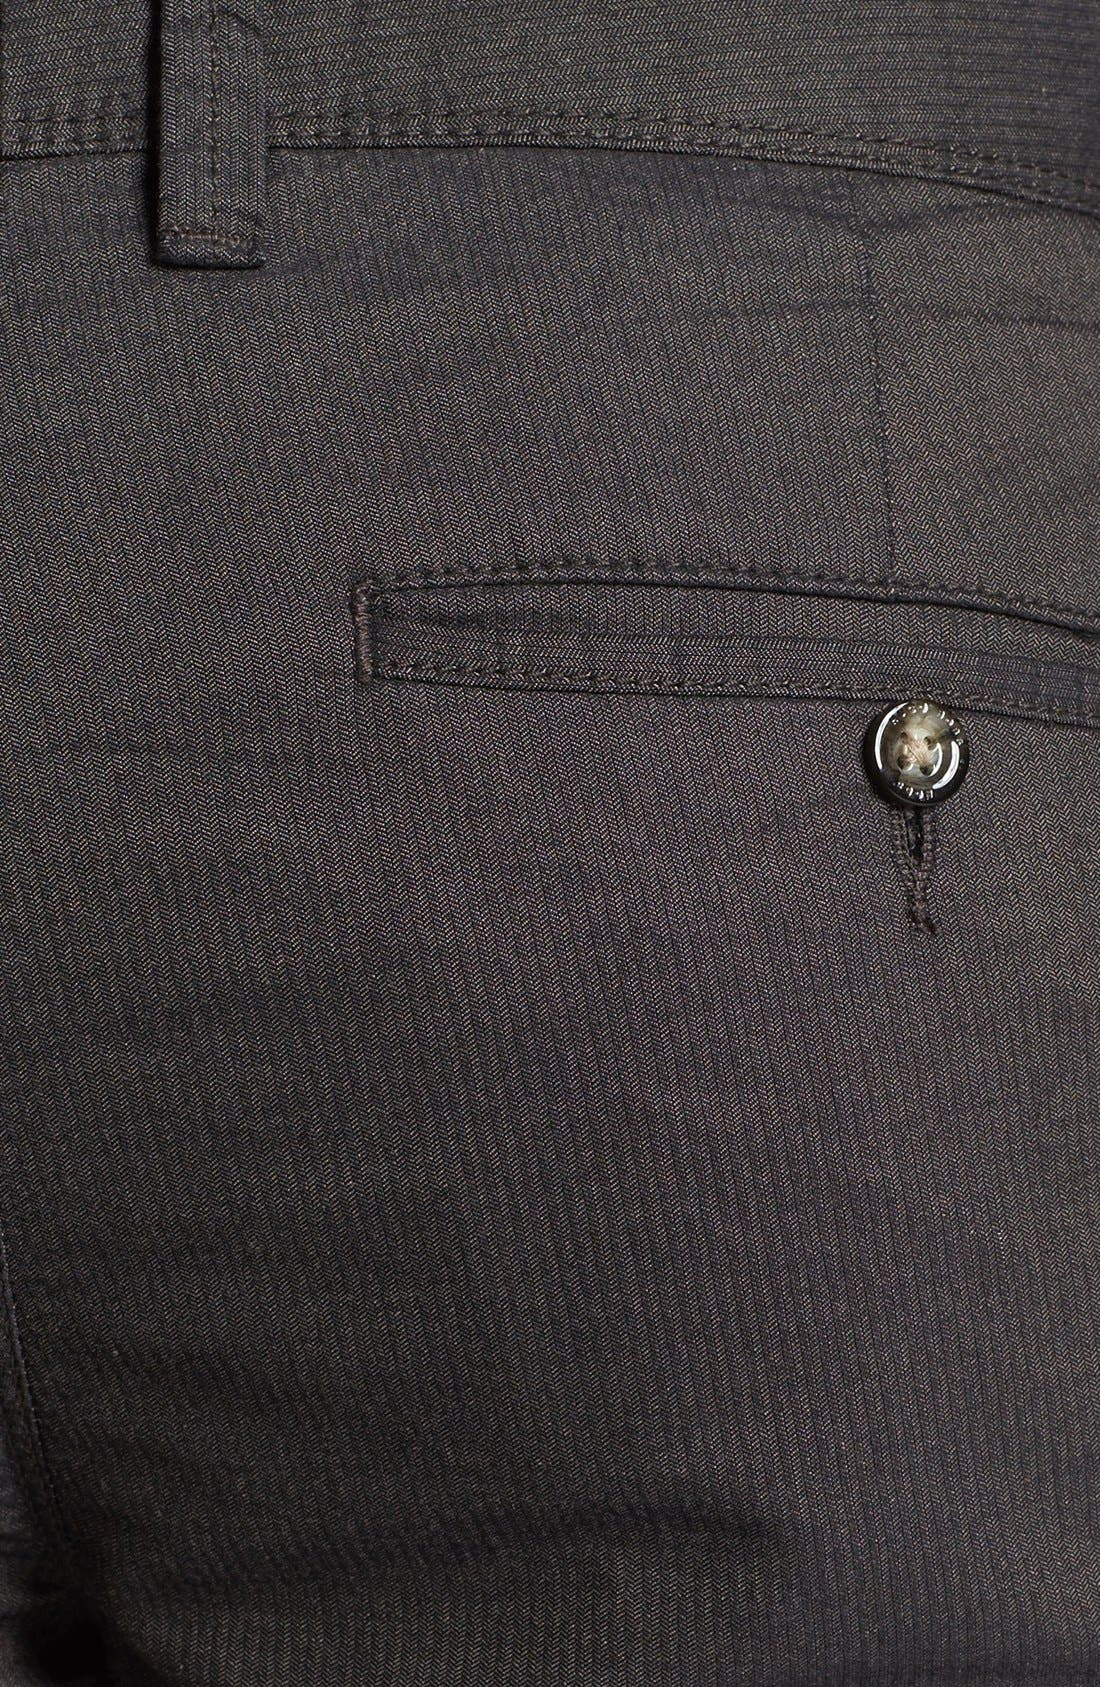 Alternate Image 3  - BOSS HUGO BOSS 'Crigan 1-7-W' Regular Fit Pants